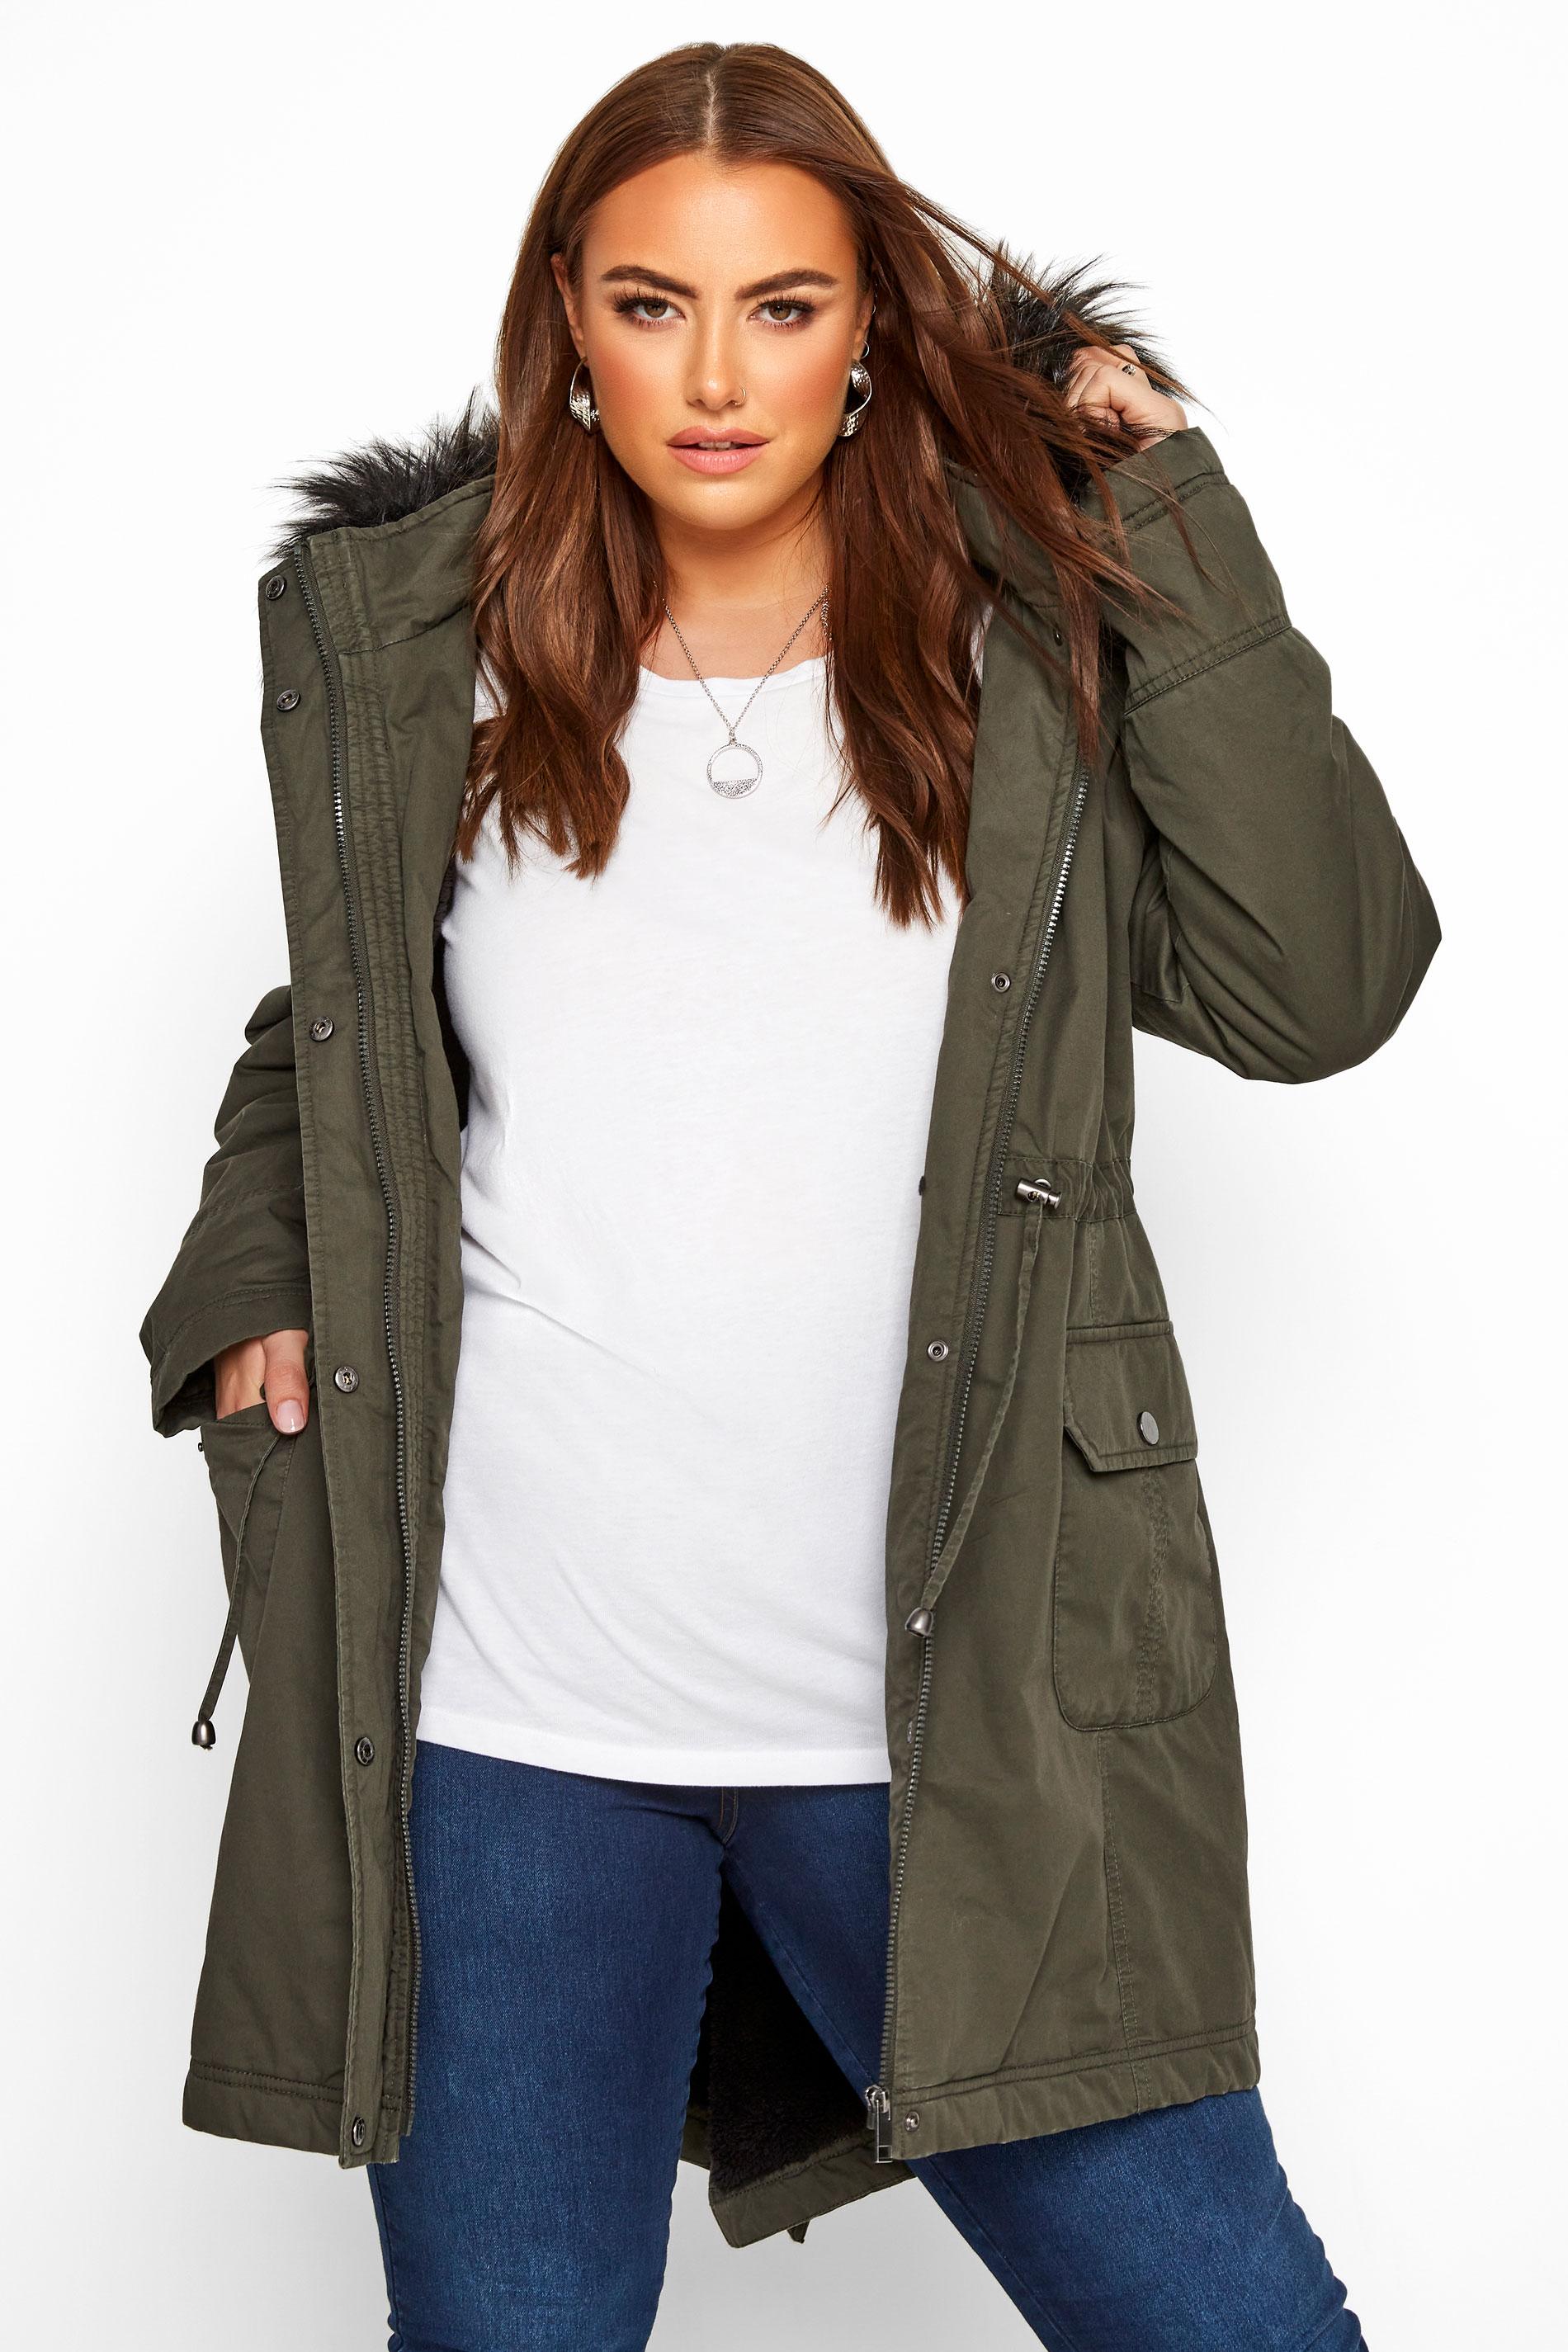 Khaki Fleece Lined Faux Fur Trim Parka Jacket